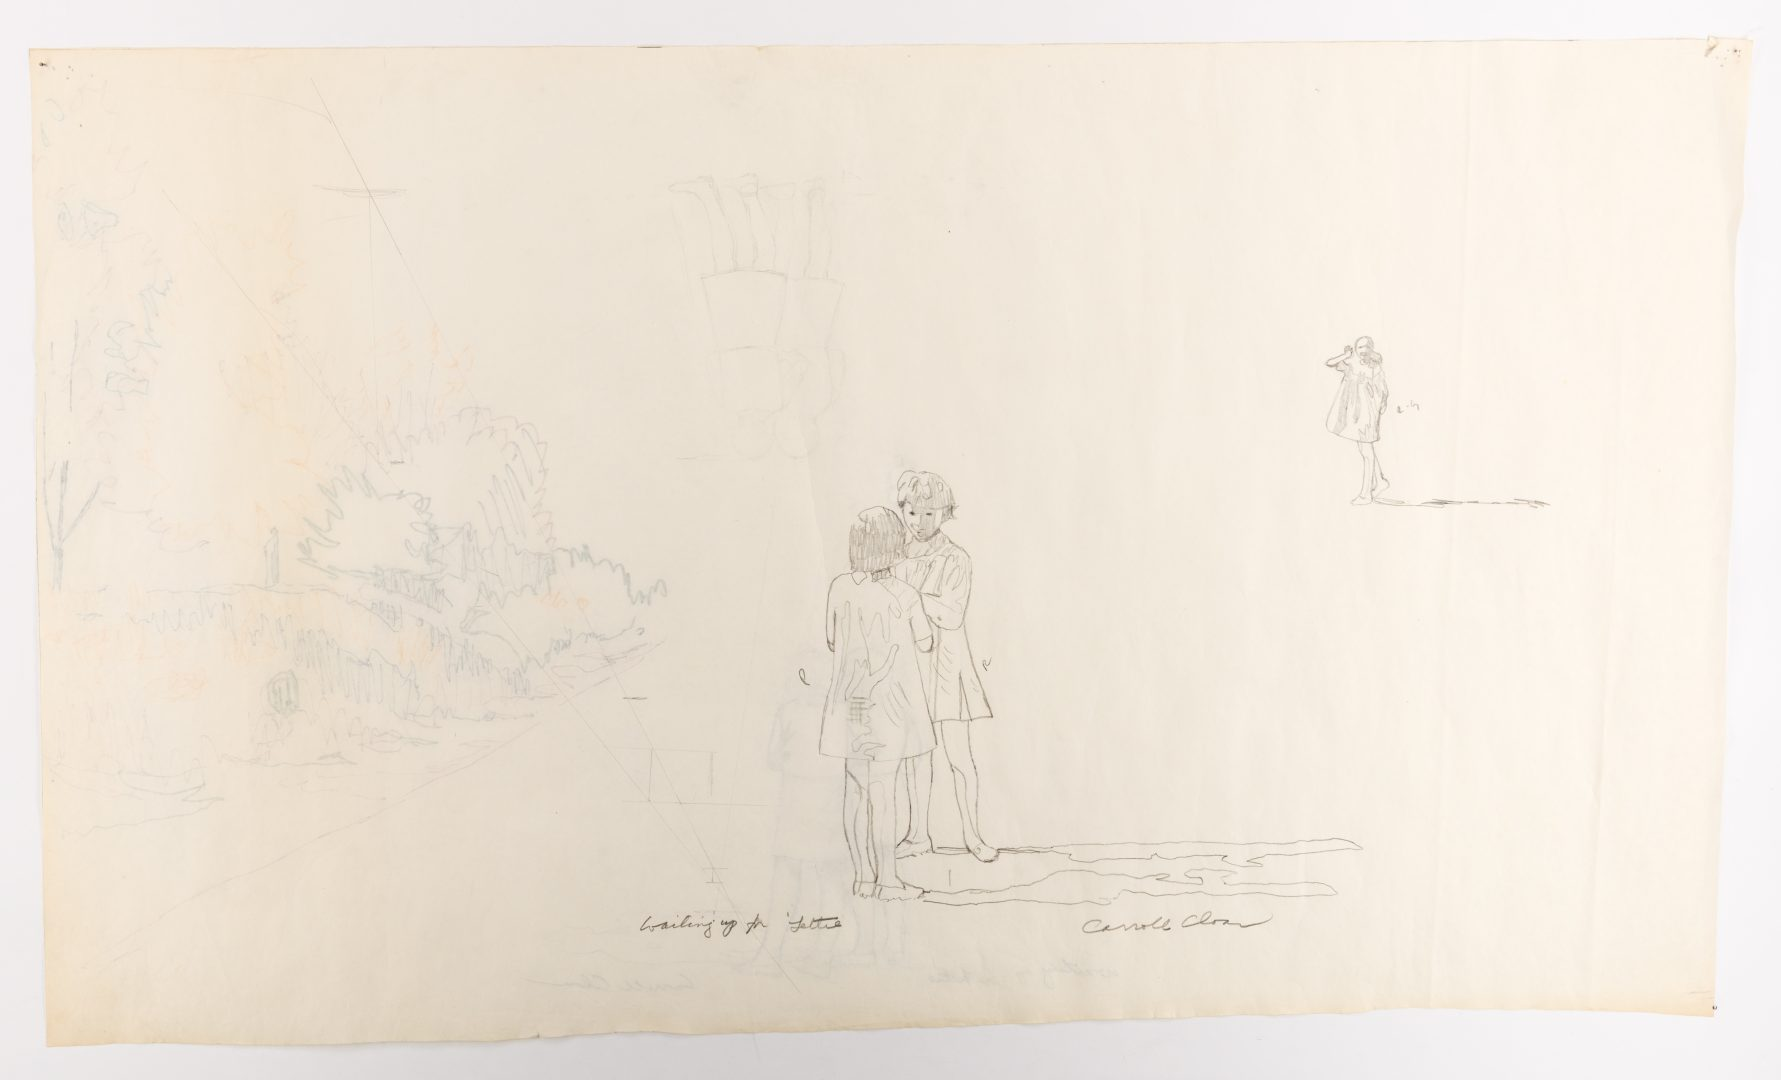 Lot 128: 2 Carroll Cloar Drawings, Waiting Up for Lettie